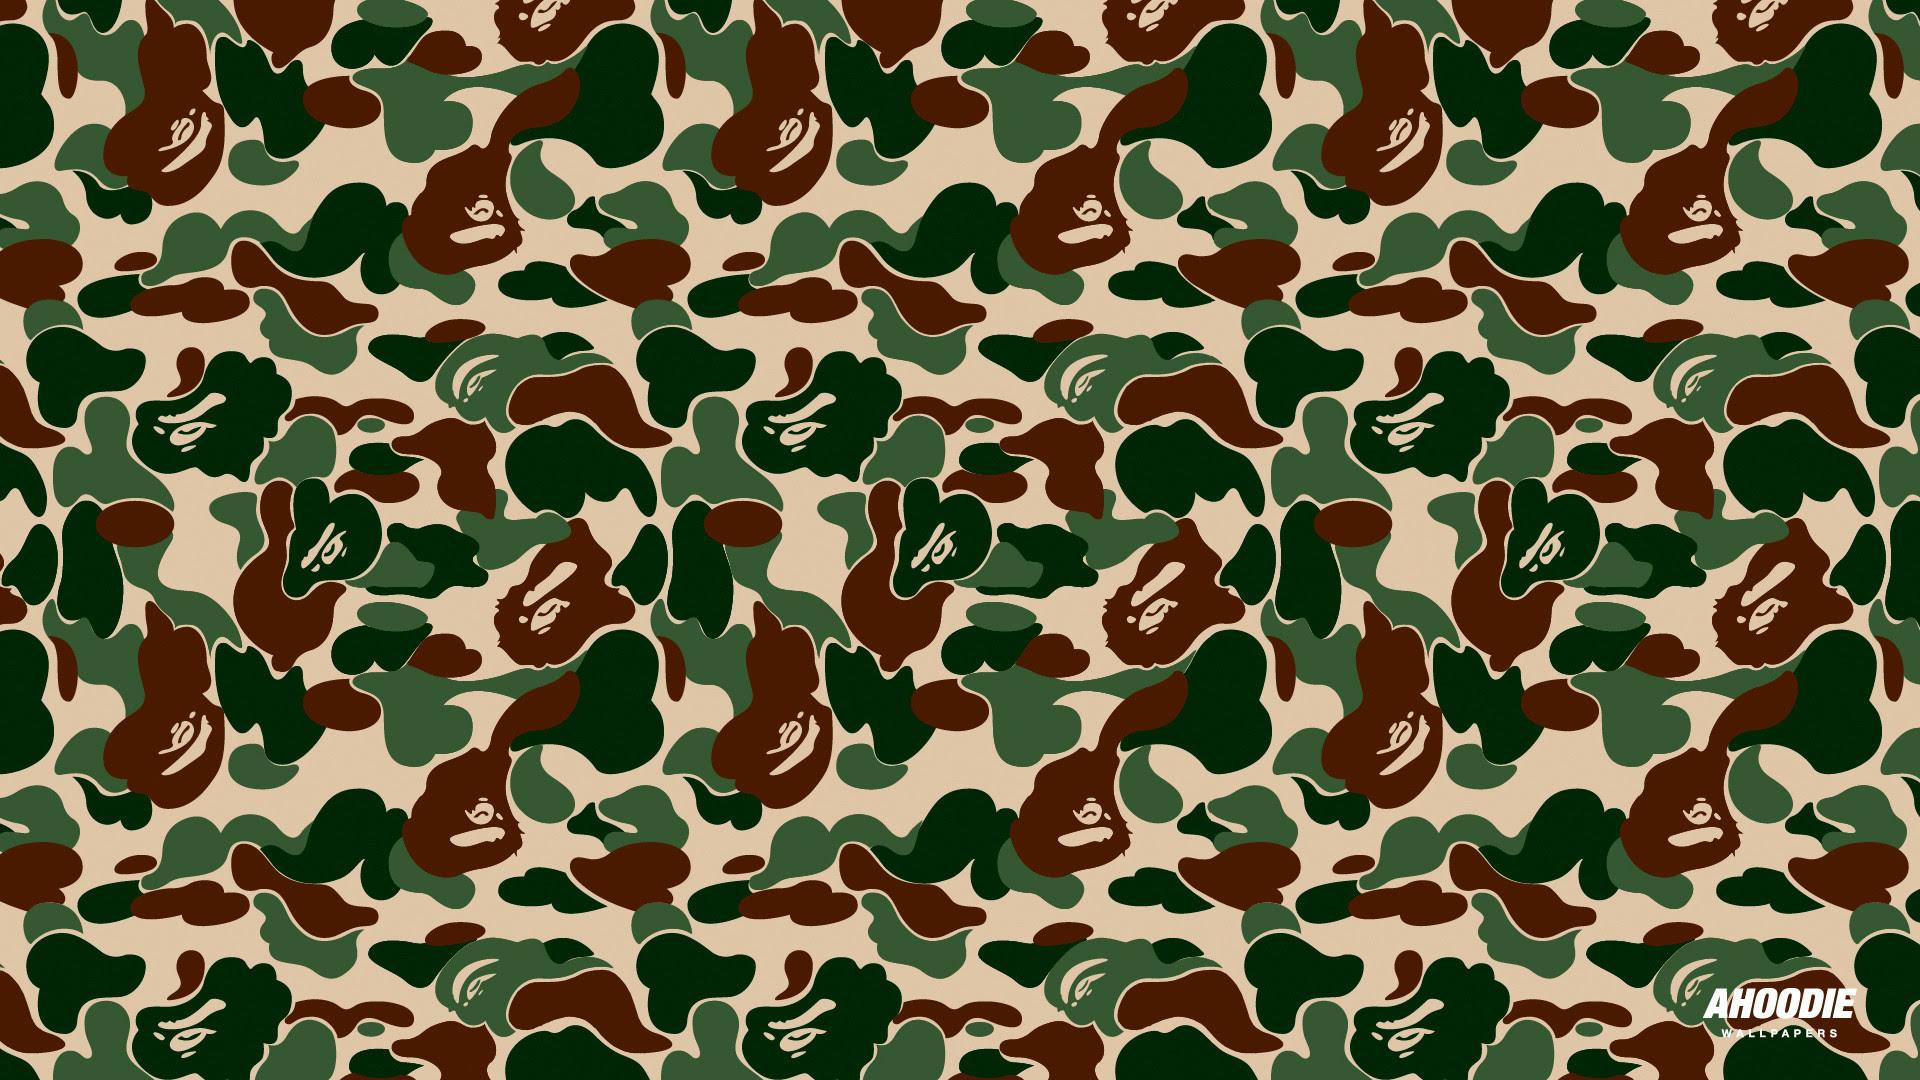 Bathing Ape Wallpaper (54  images)